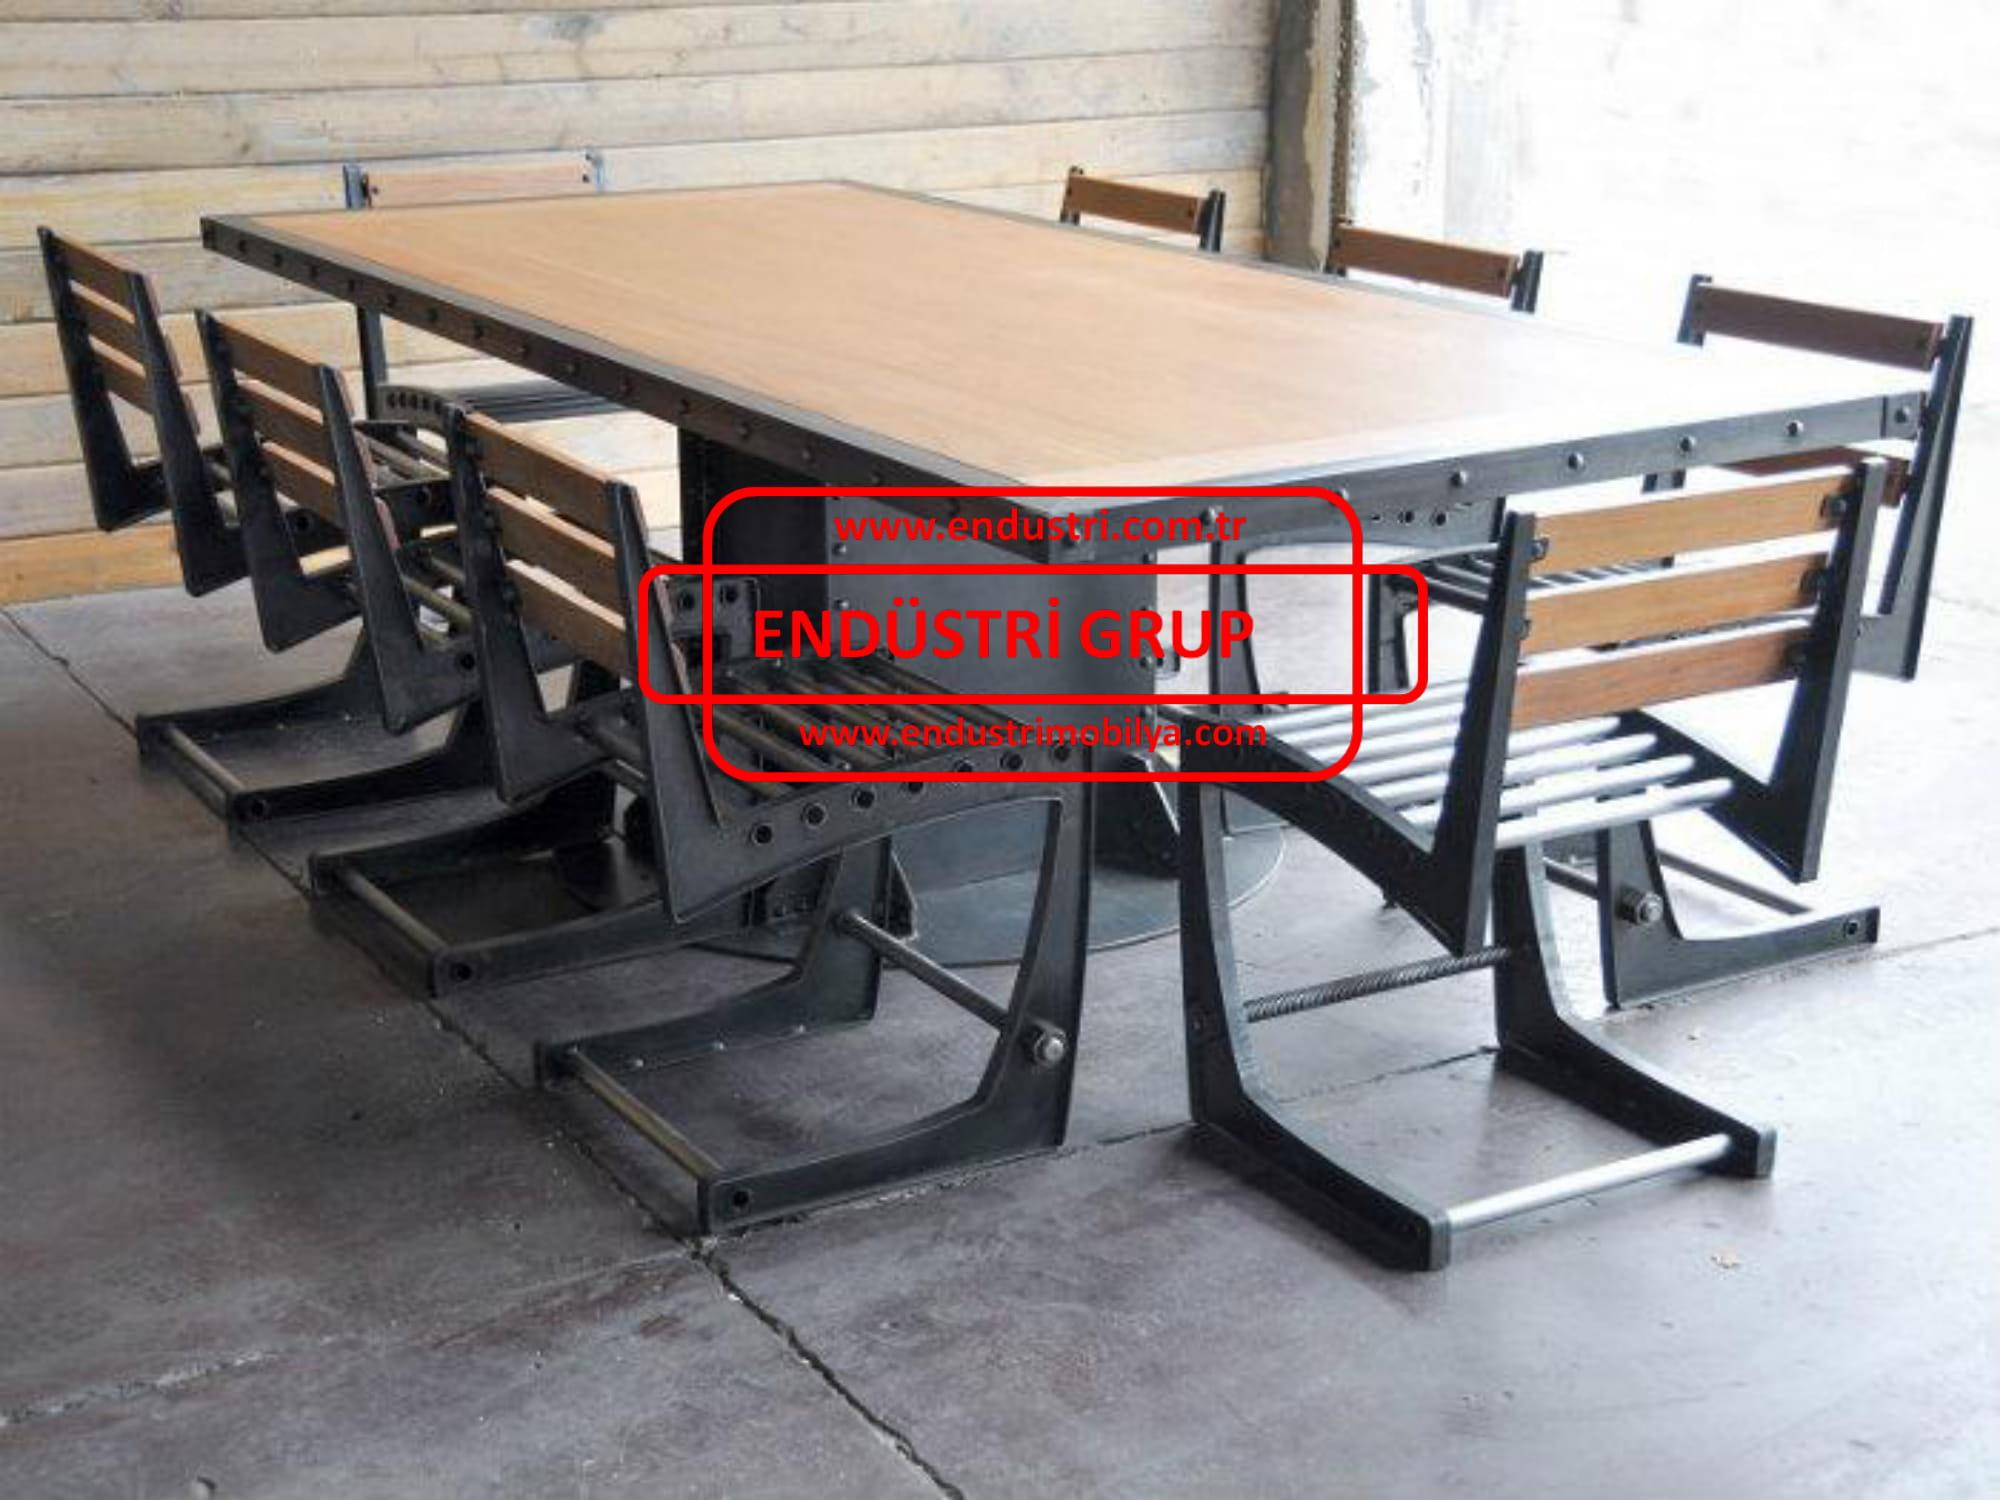 endustriyel-endustri-mobilya-esya-tasarimi-tasarimlari-vintage-urunler-imalati (1)